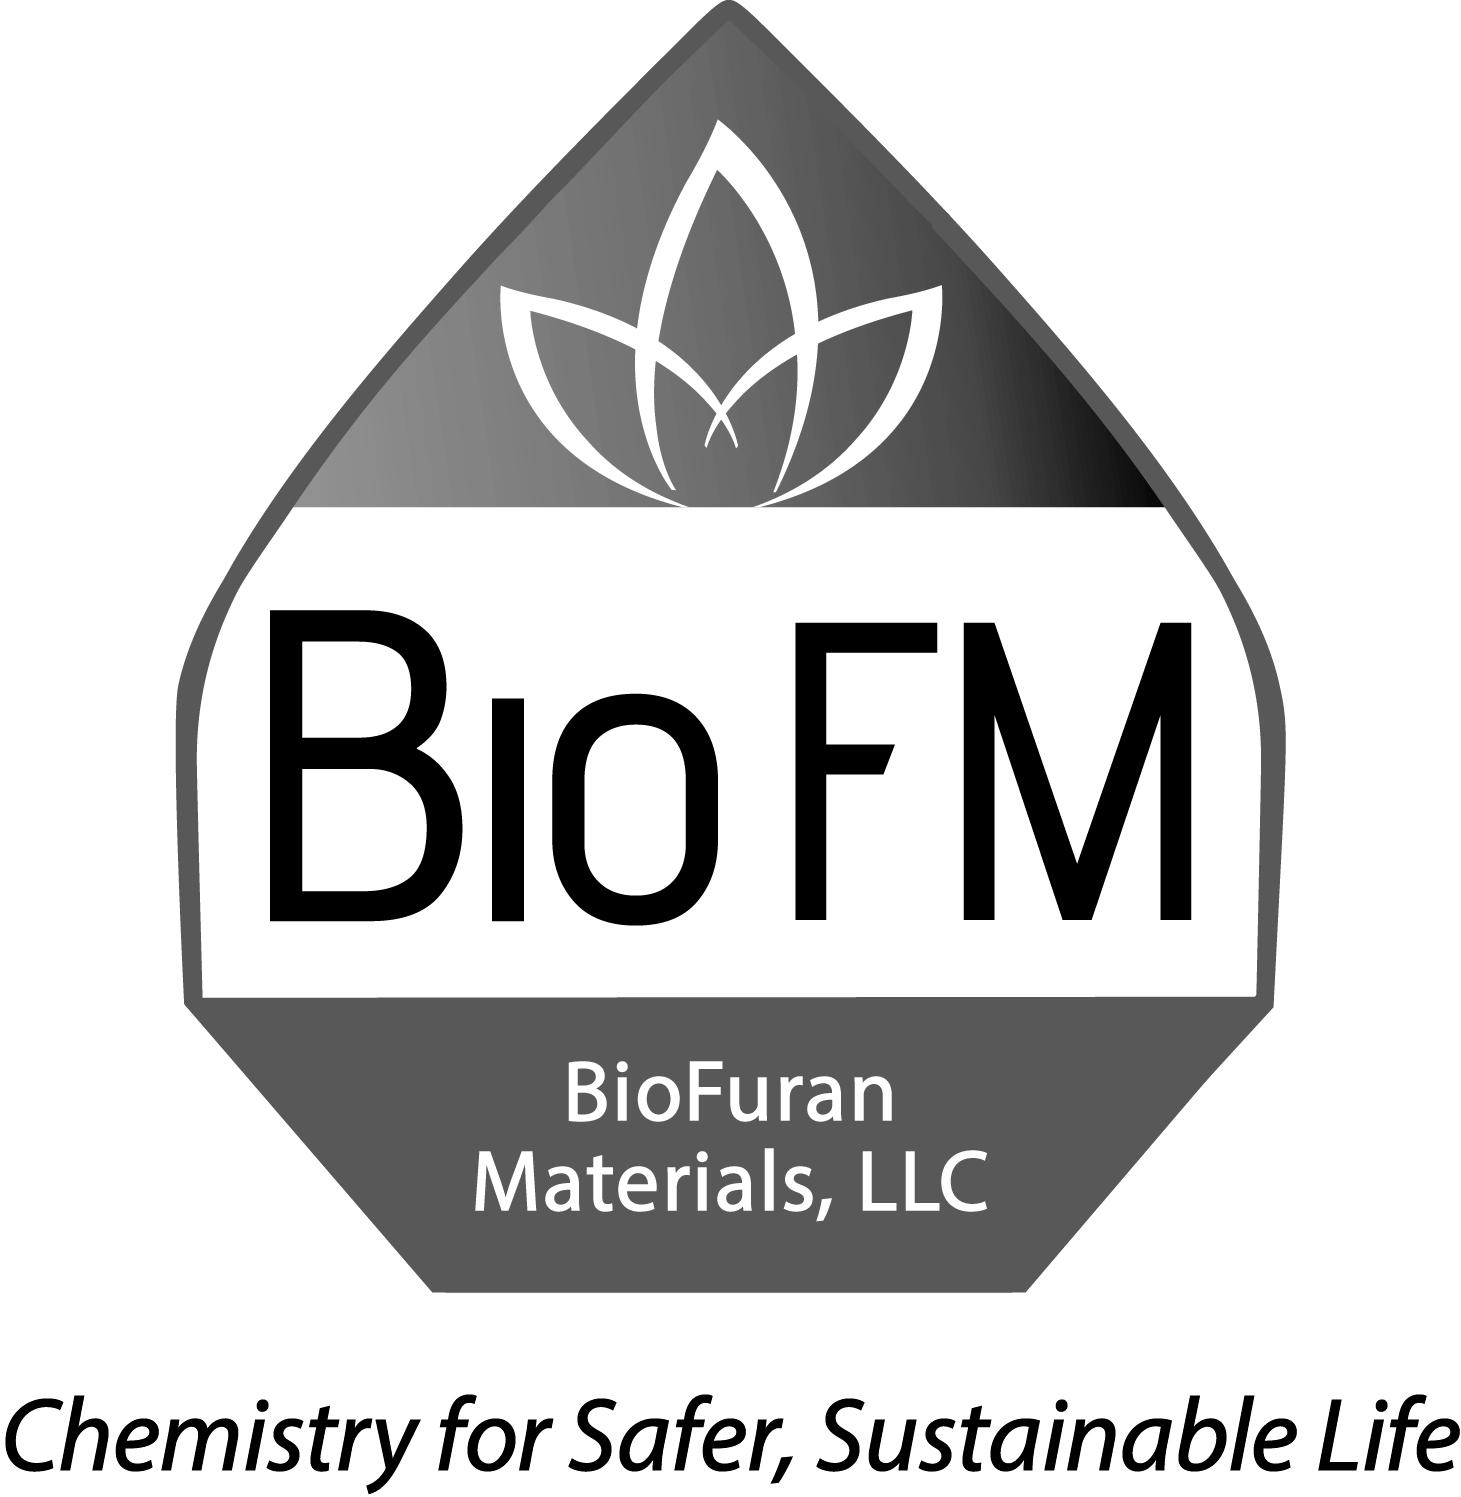 BioFuran Materials LLC